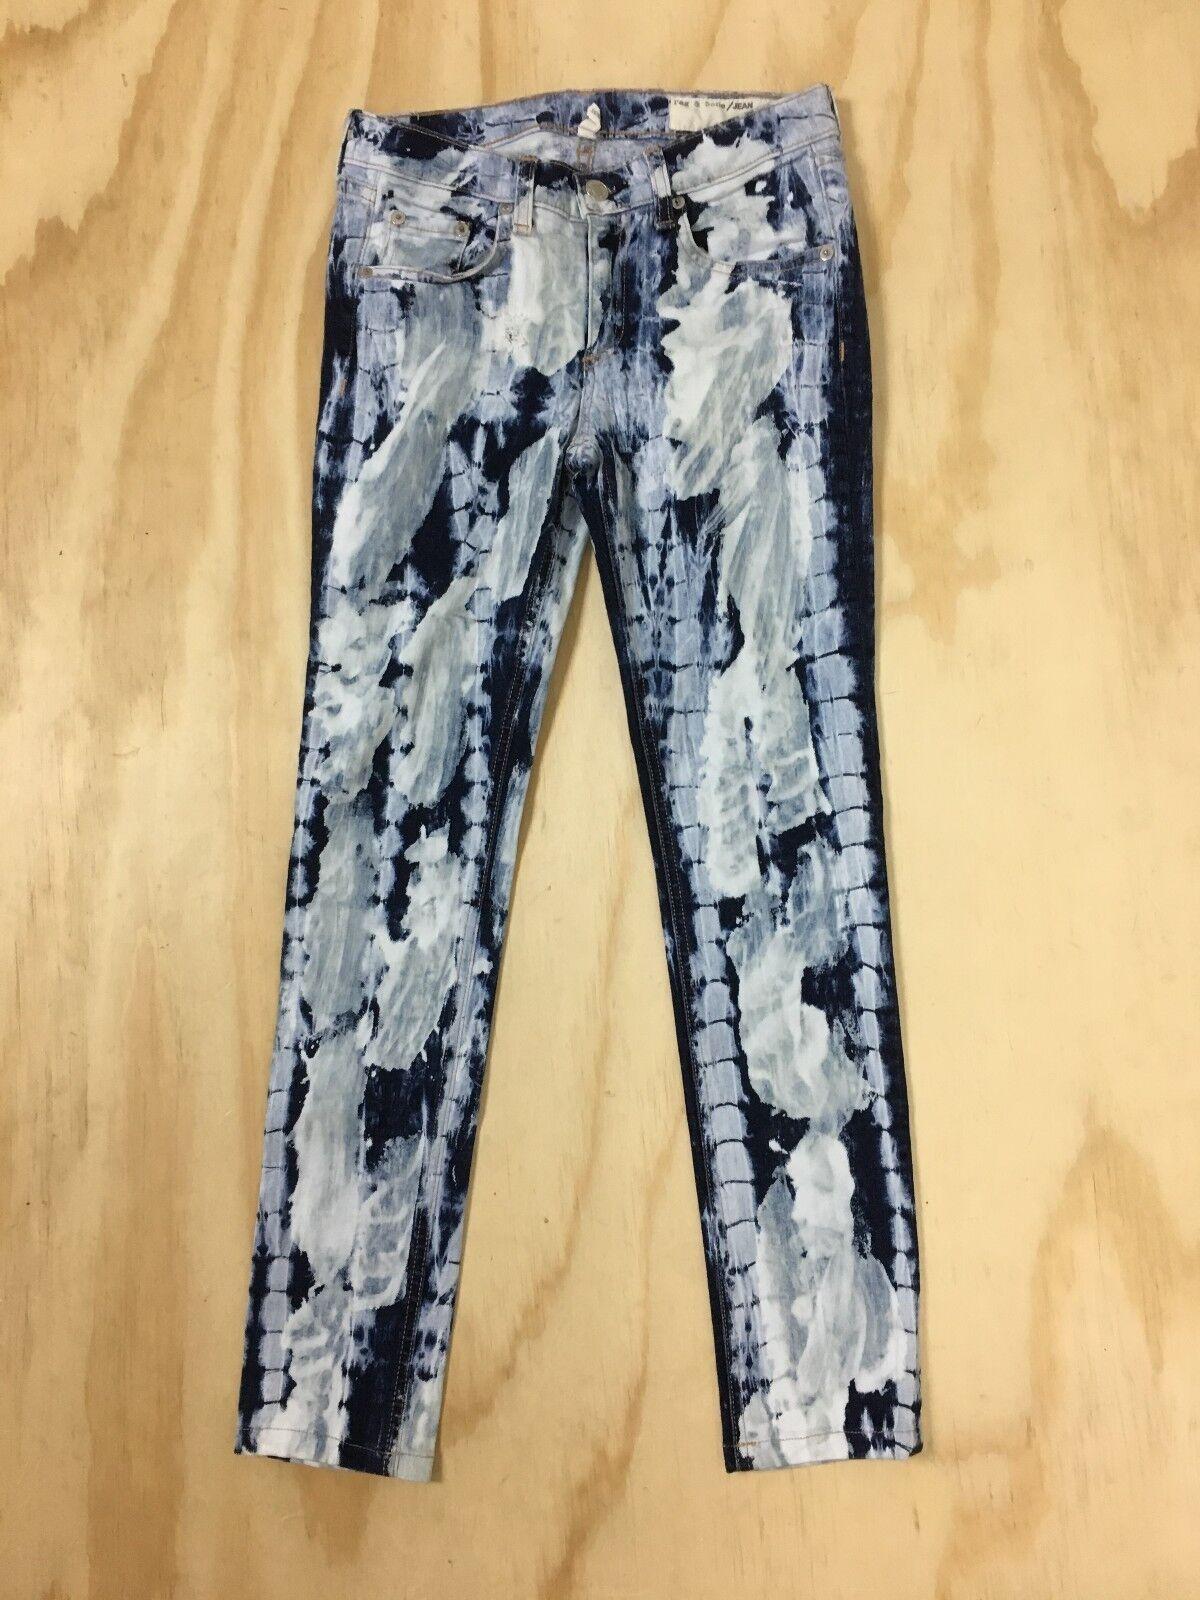 Rag & bone Skinny Splatter Stretch Denim Jeans Women's 26 x 27 bluee and White